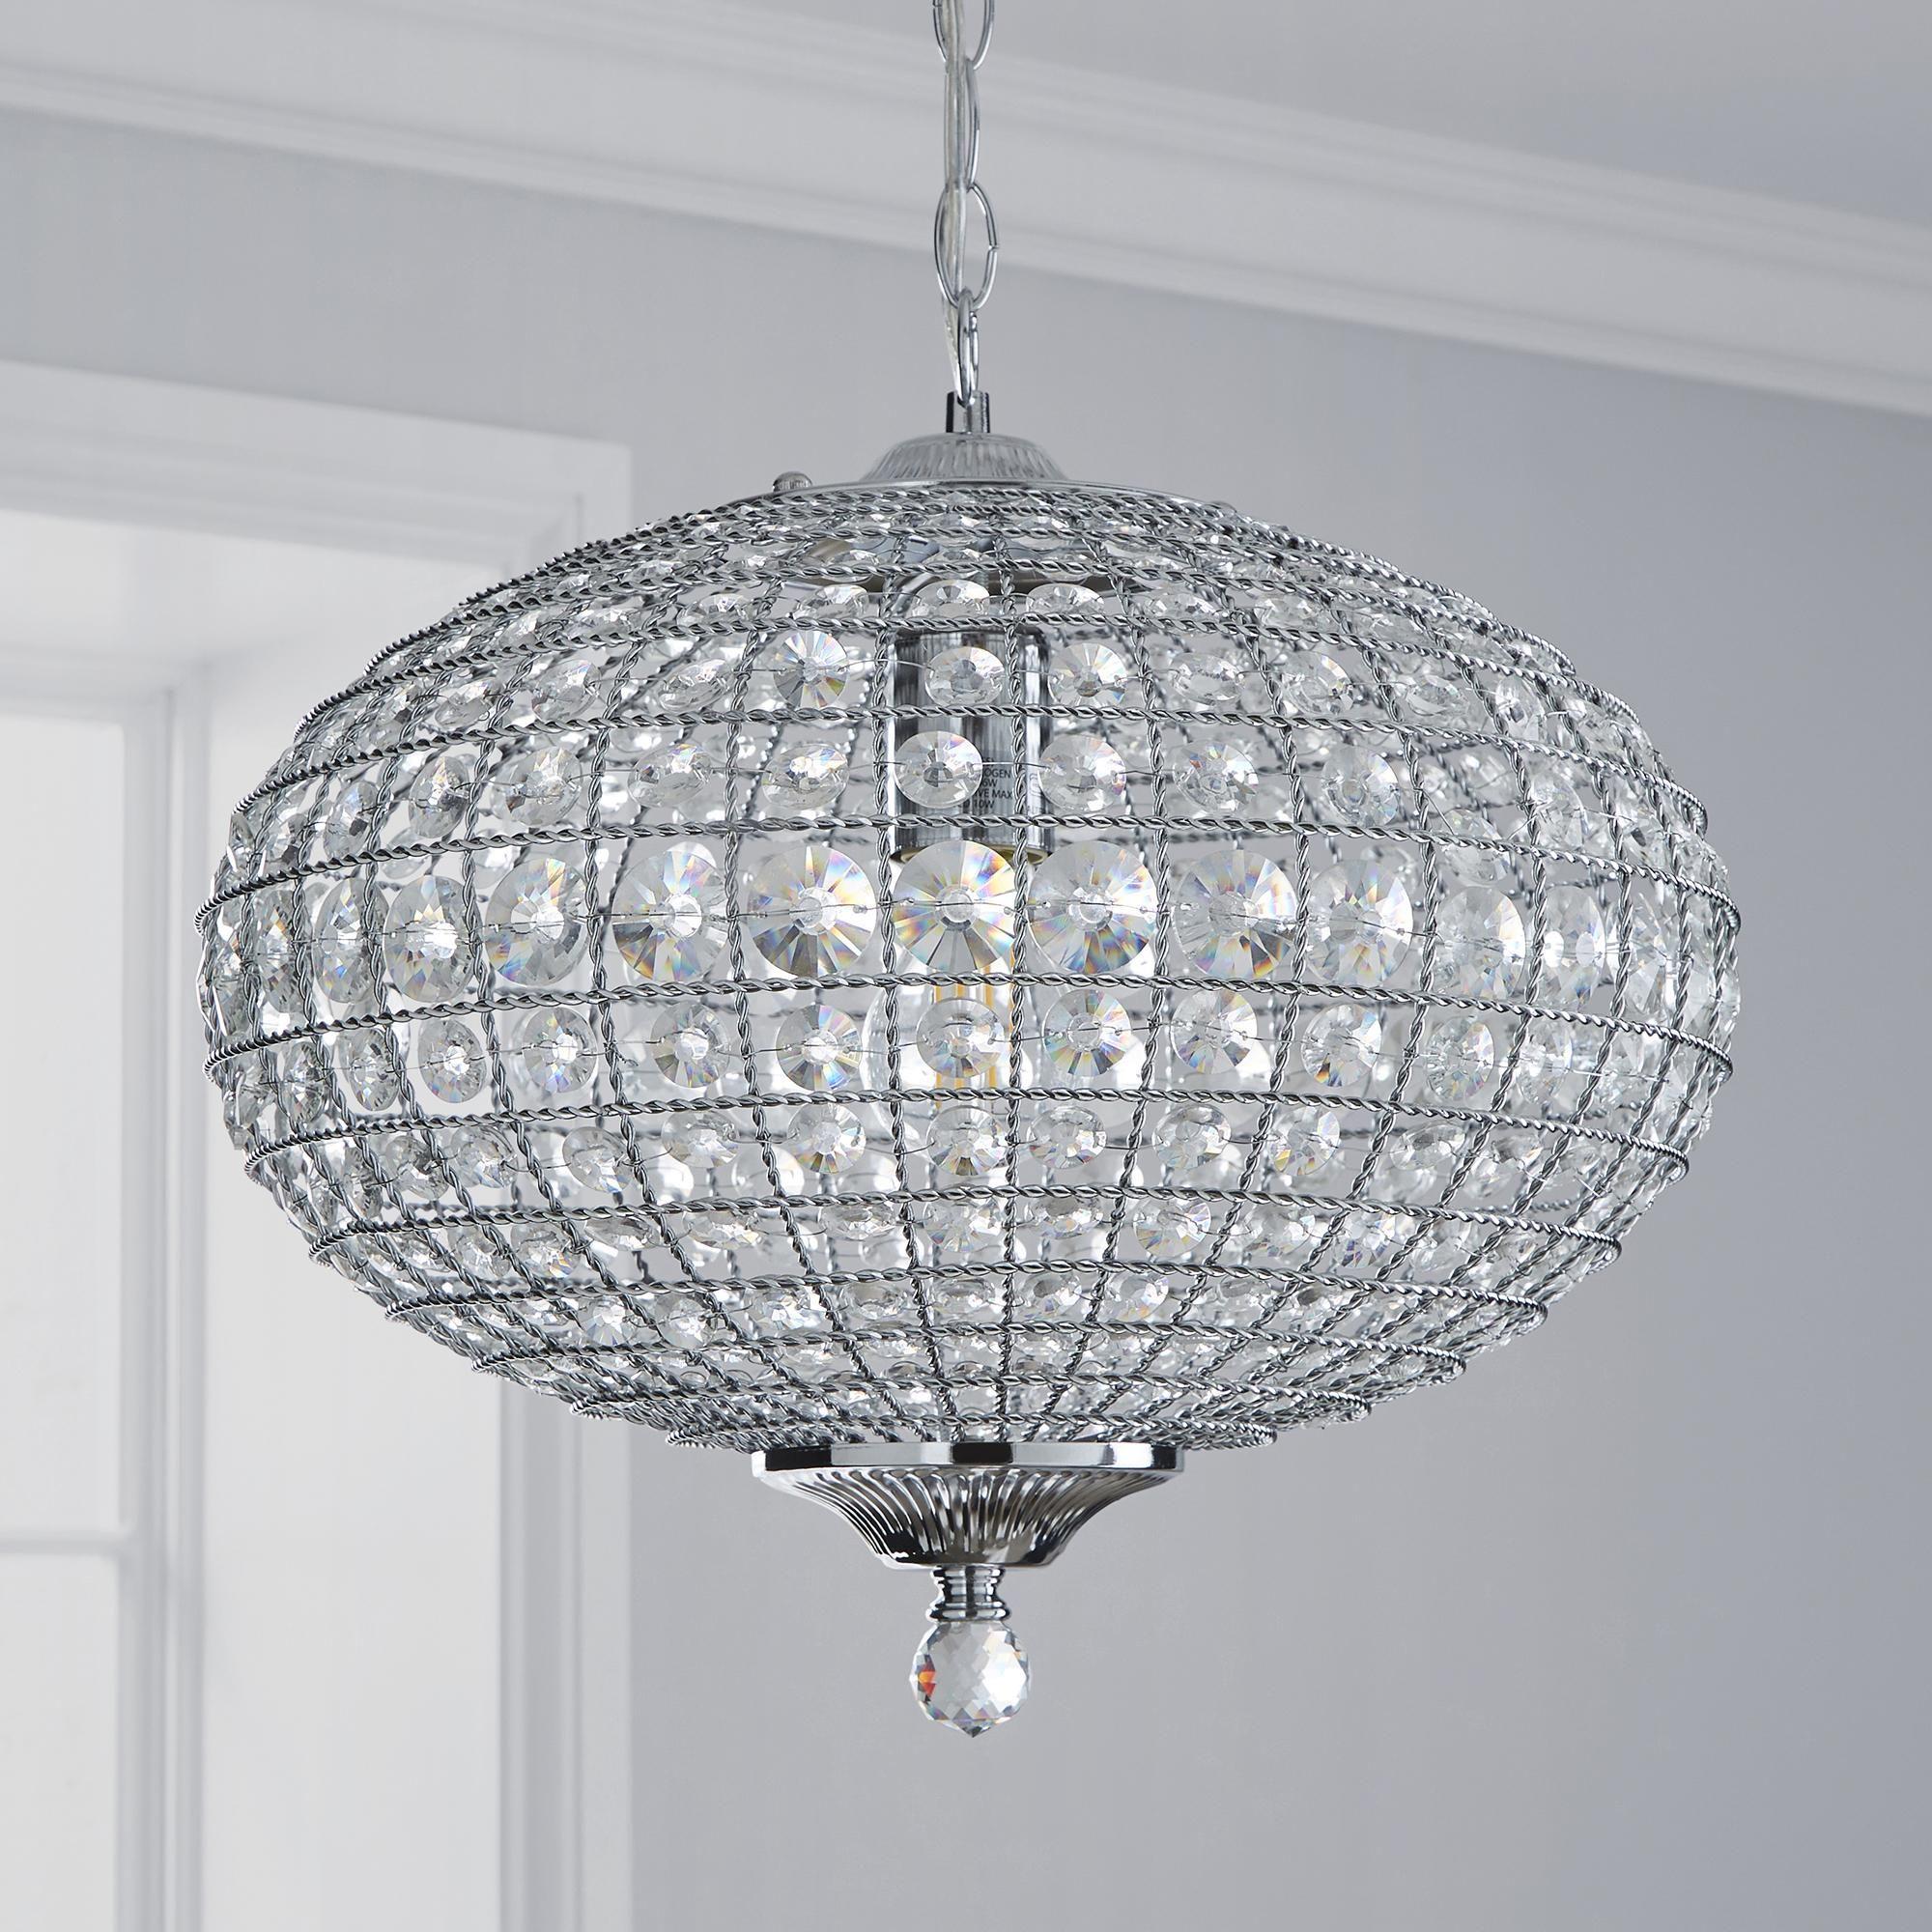 Felicity 1 Light Pendant Jewel Chrome Ceiling Fitting In 2020 Ceiling Lights Light Fittings Ceiling